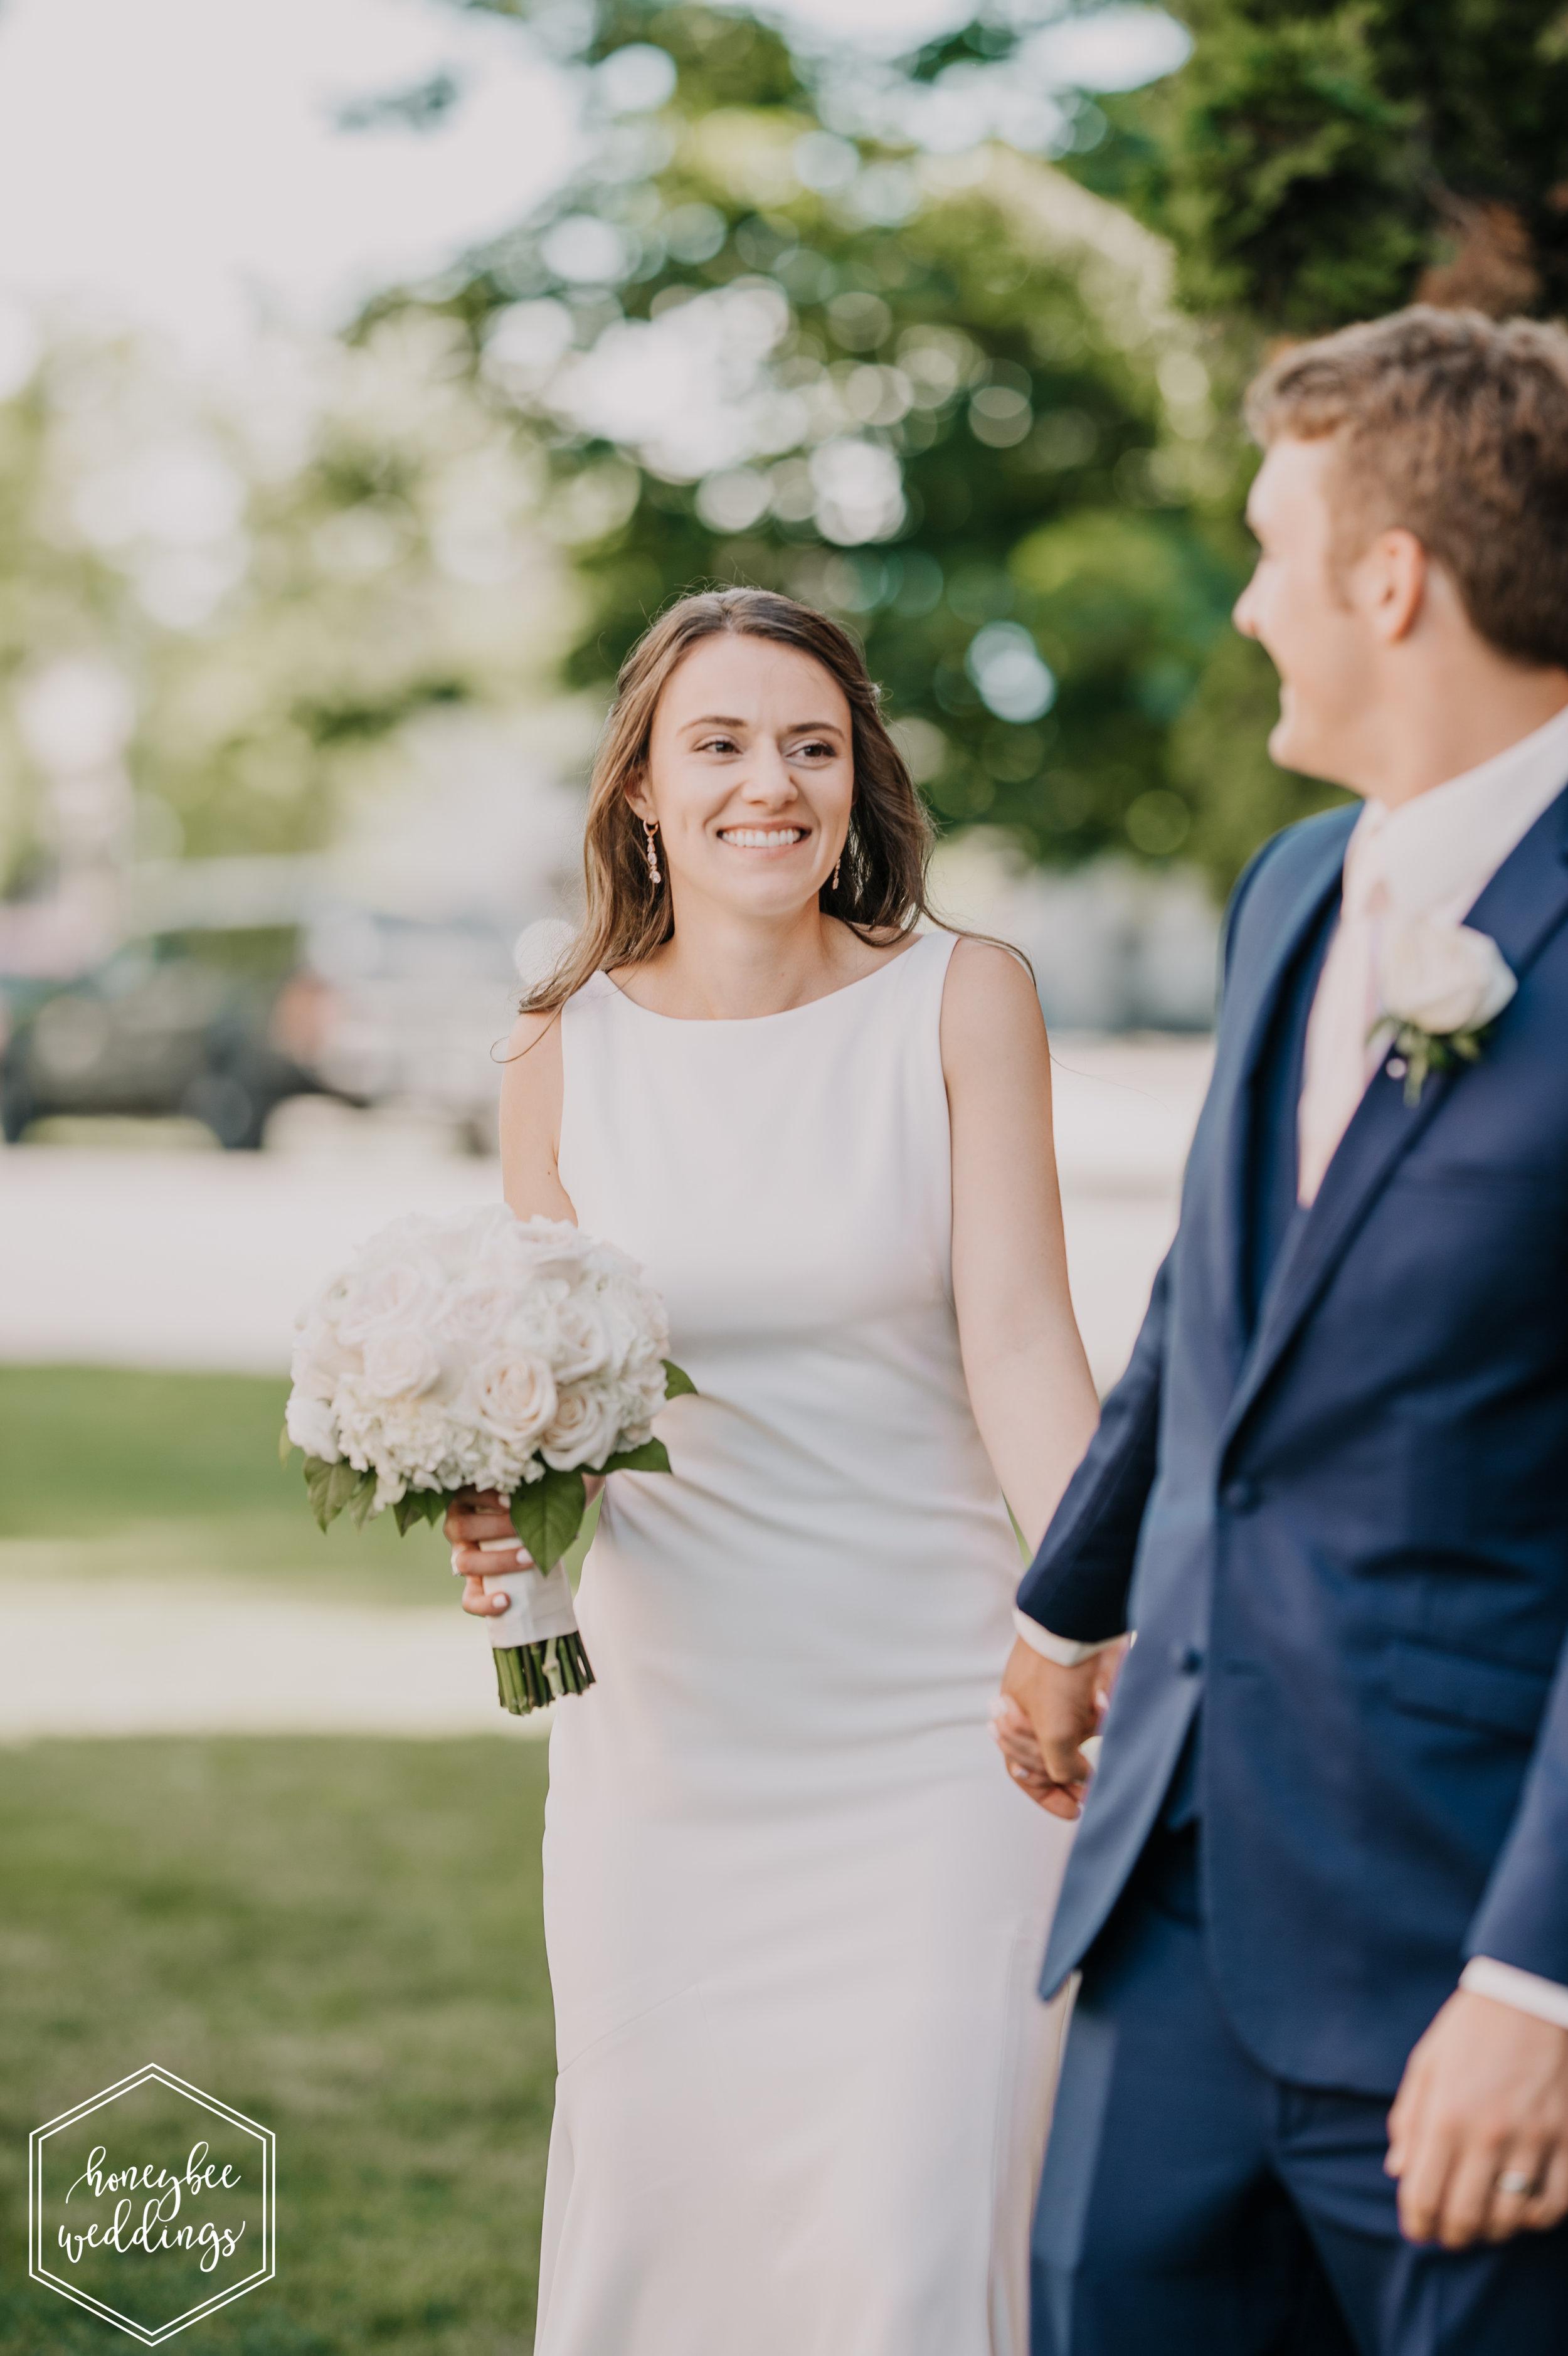 30 Montana Wedding Photographer_St. Francis Wedding_Tifani Zanto + Ryan Burke -5950-2.jpg